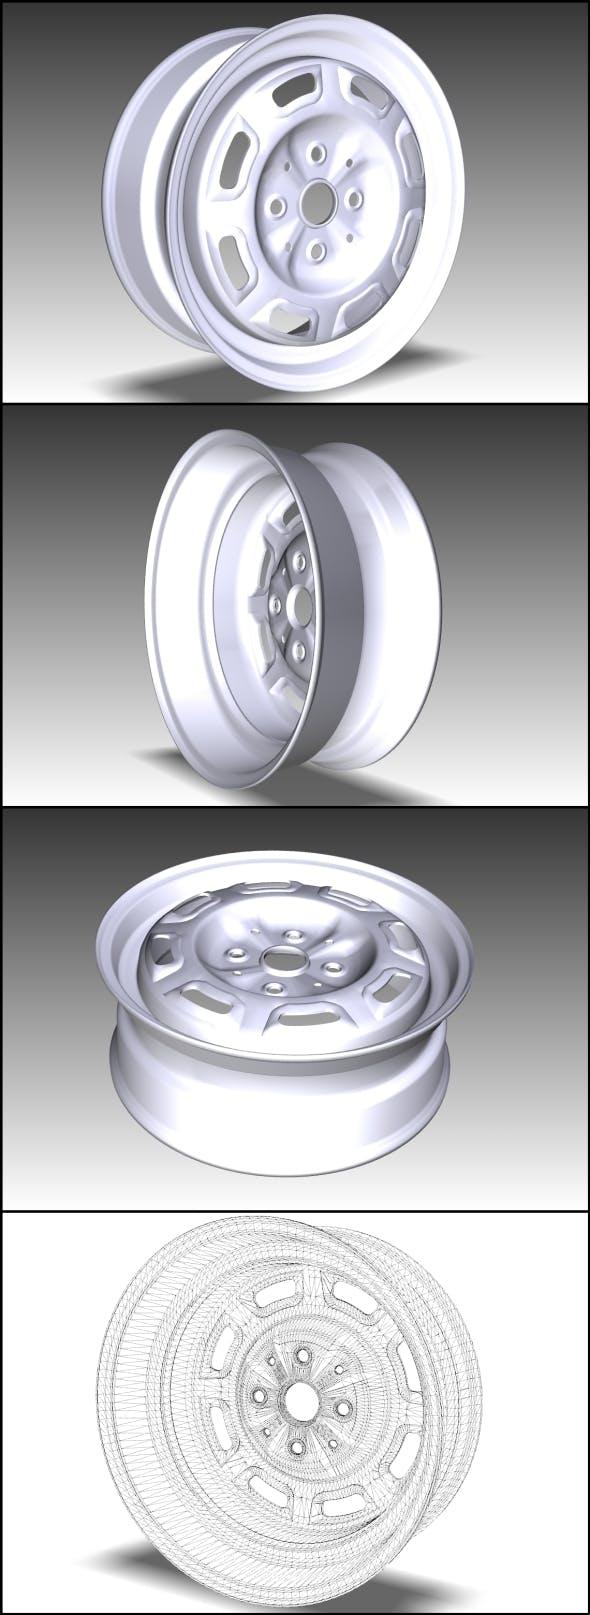 Wheel of standart car (Low Poly) - 3DOcean Item for Sale